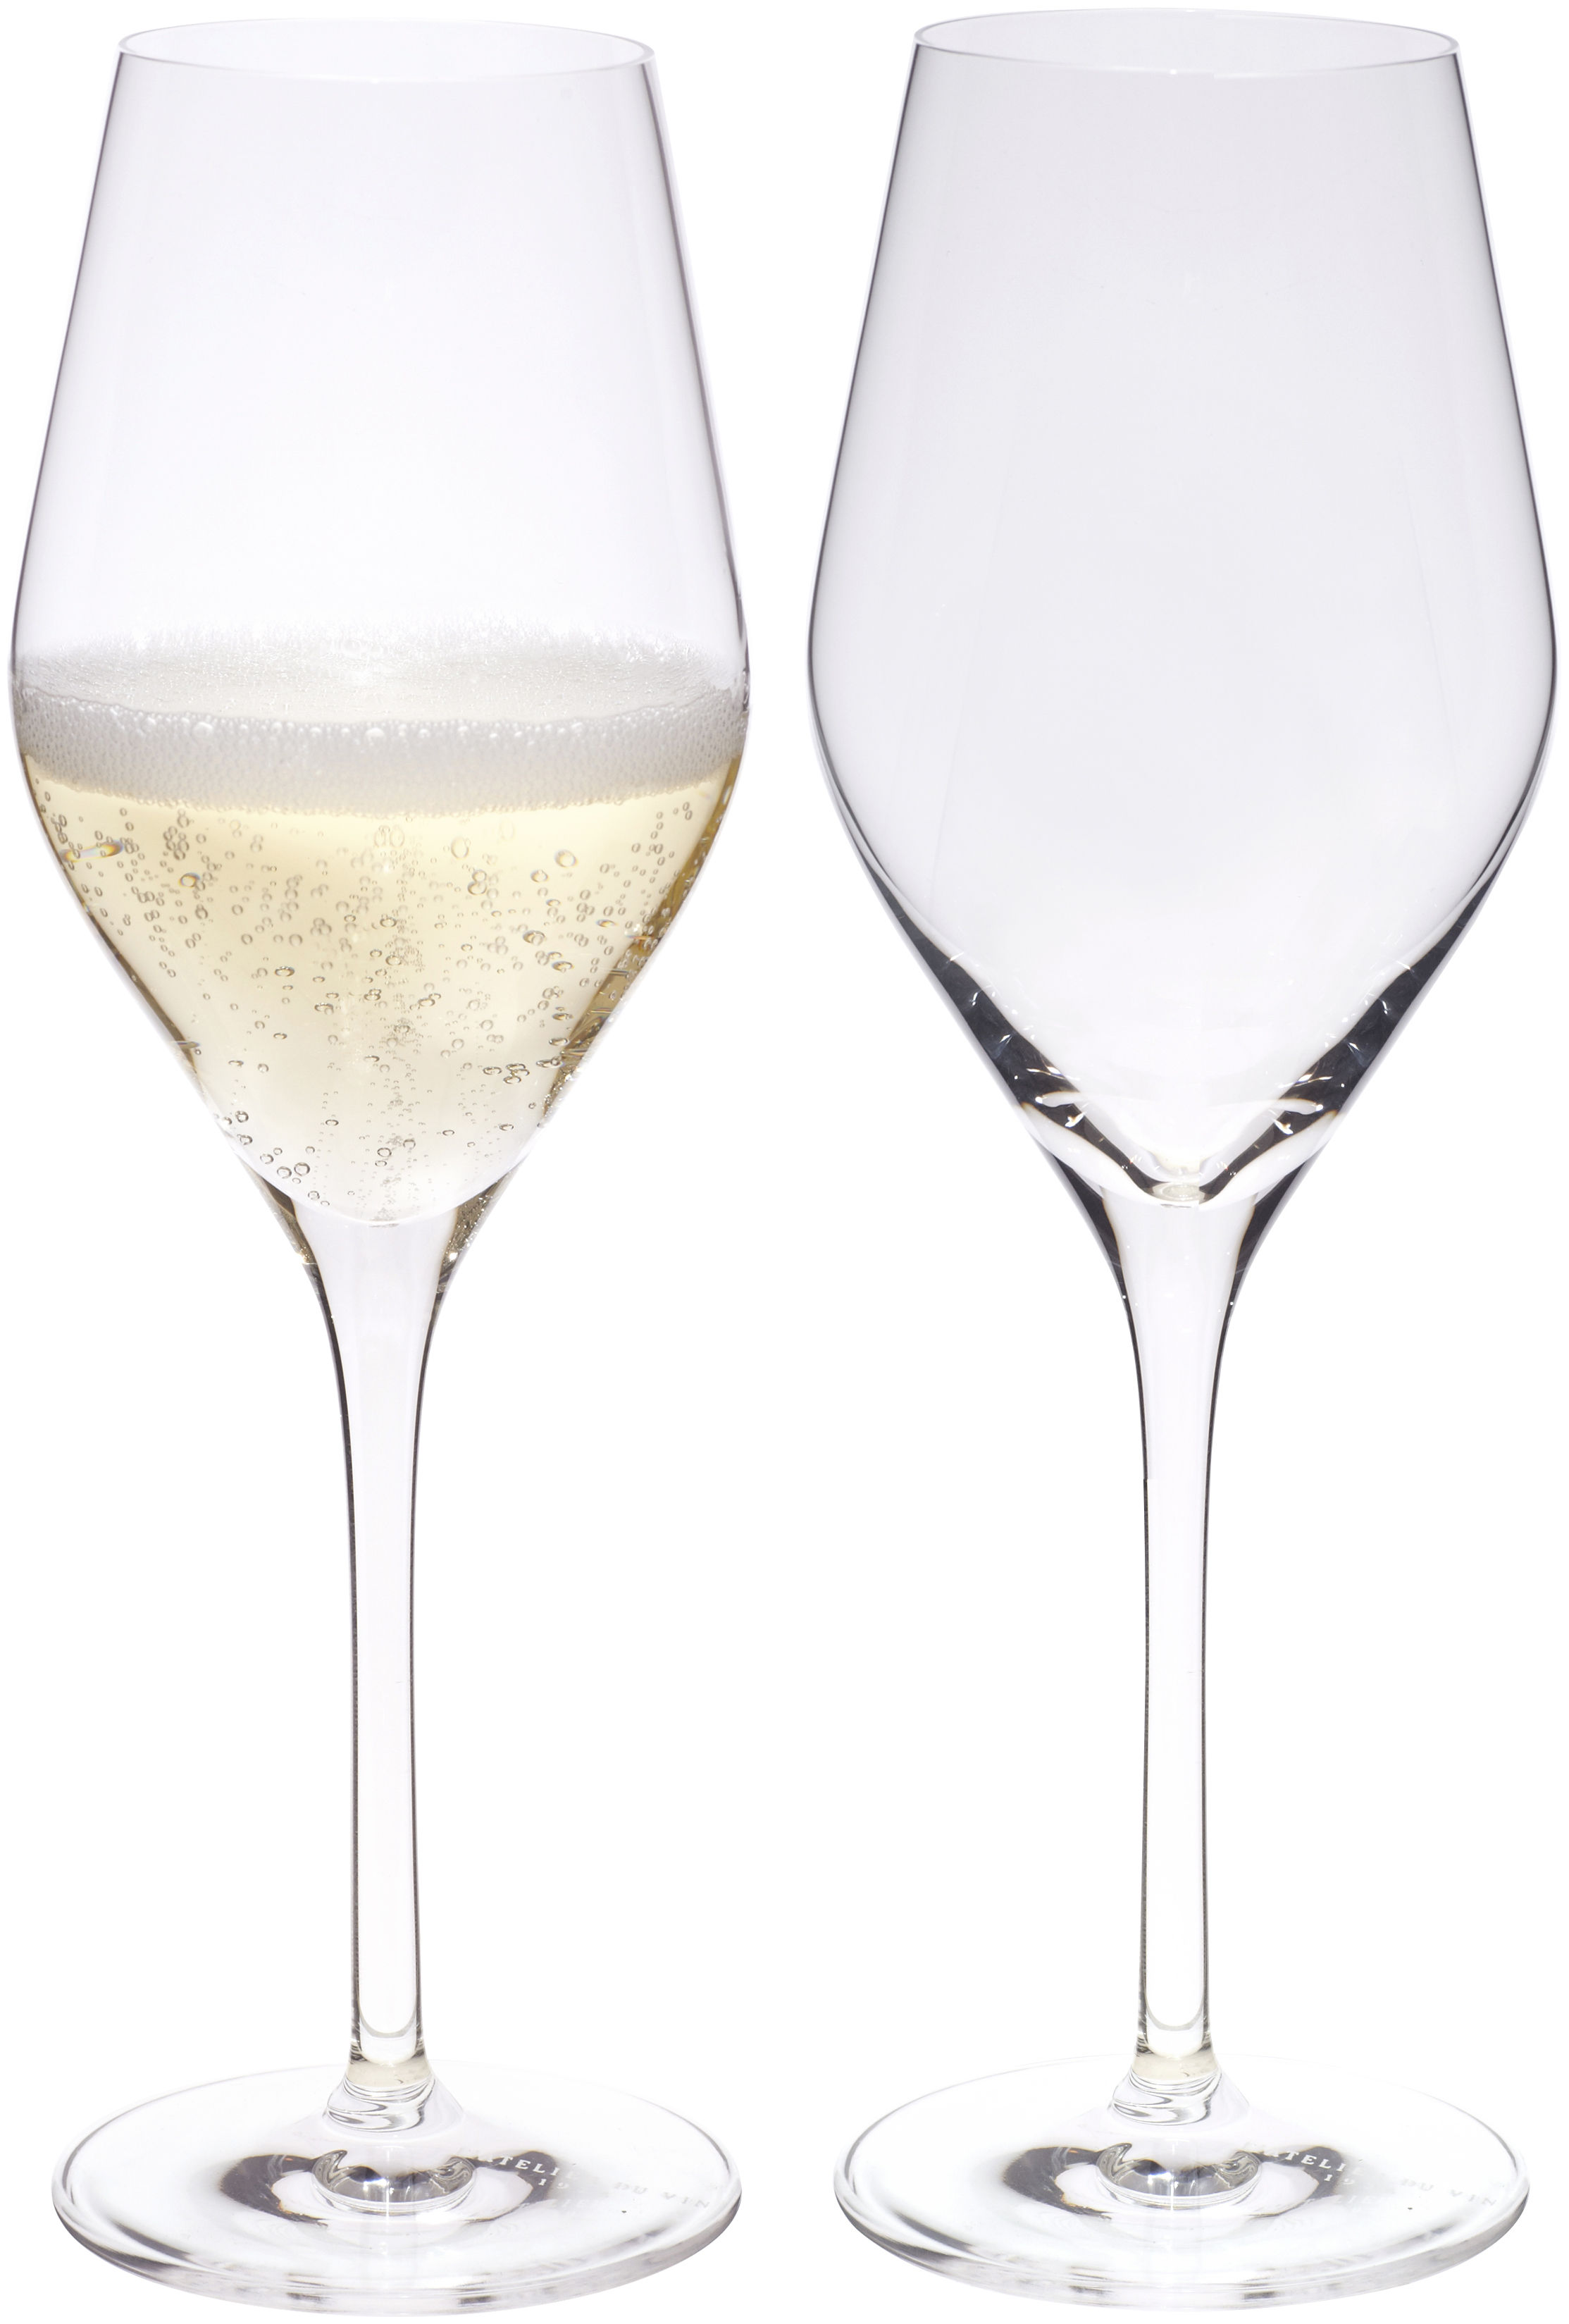 Tischkultur - Gläser - Good Size Sektgläser / 2er-Set - L'Atelier du Vin - Transparent -  Nesium®, Verre cristallin soufflé